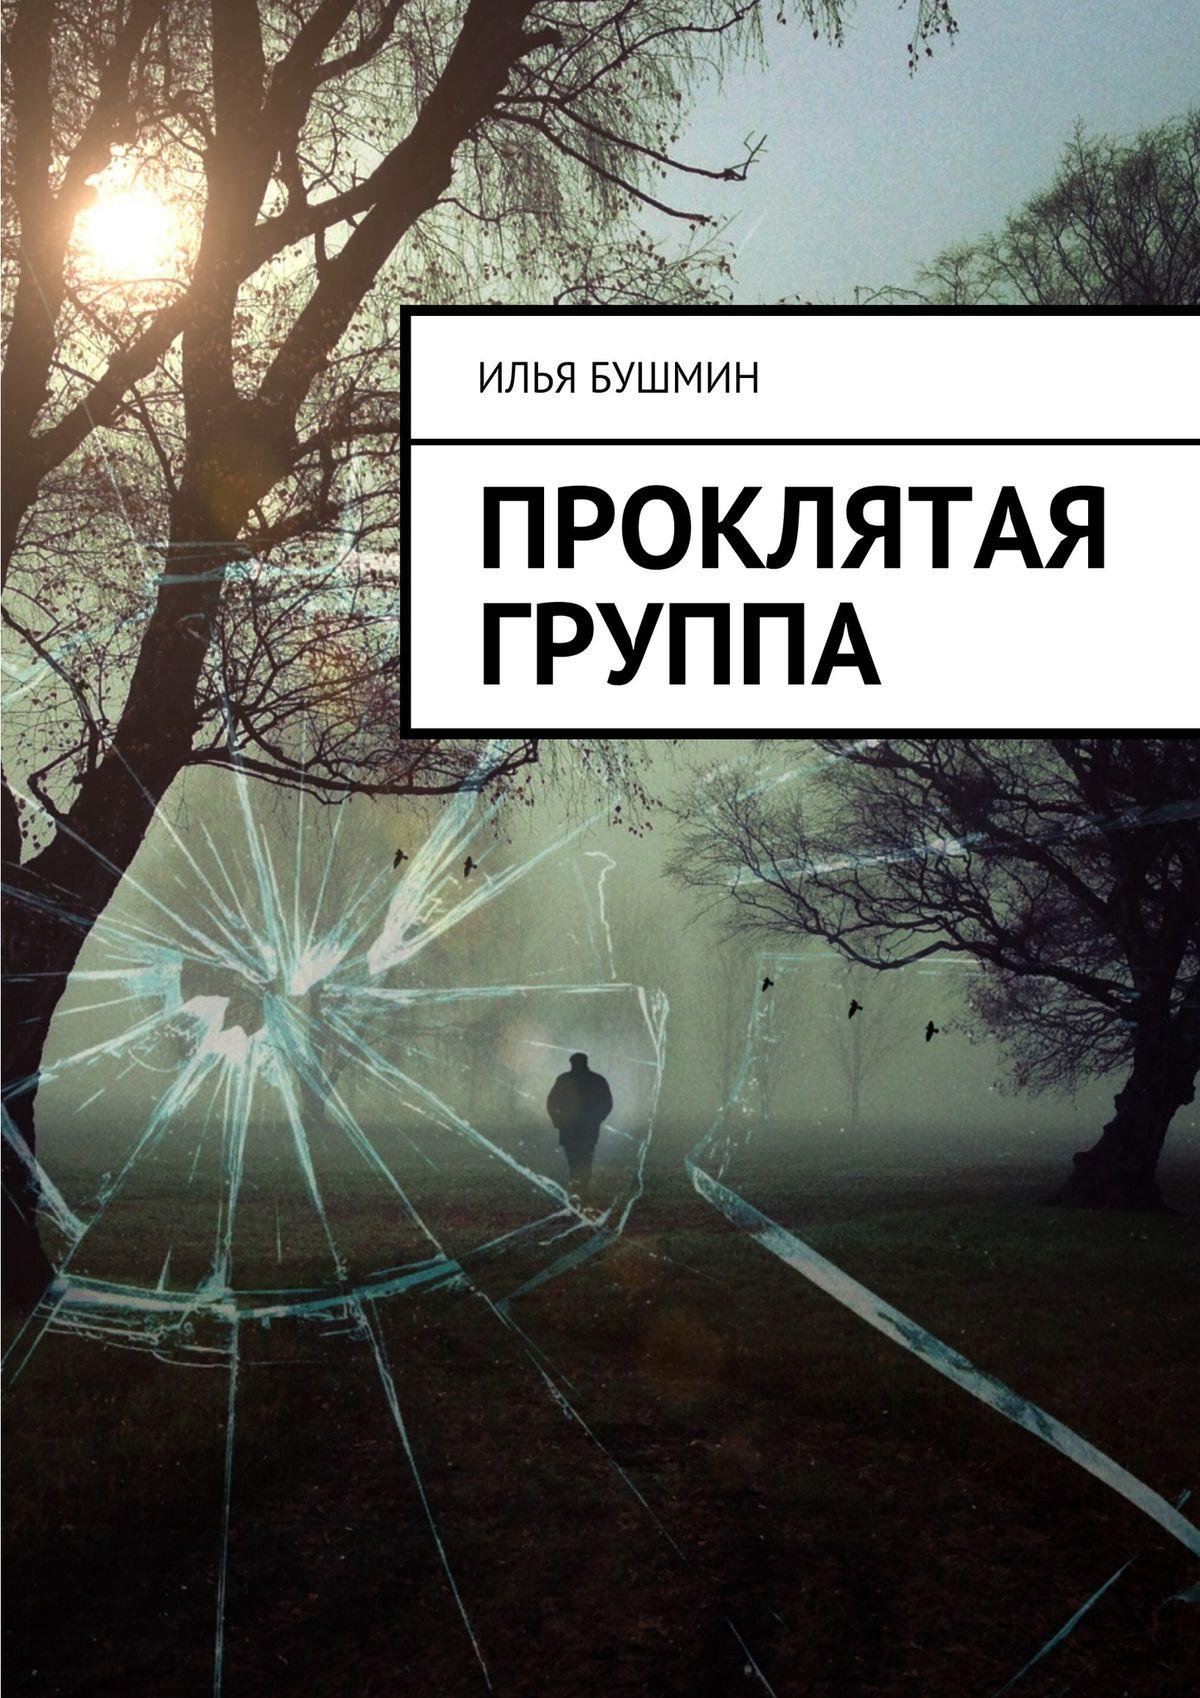 Илья Бушмин Проклятая группа илья бушмин один из нас